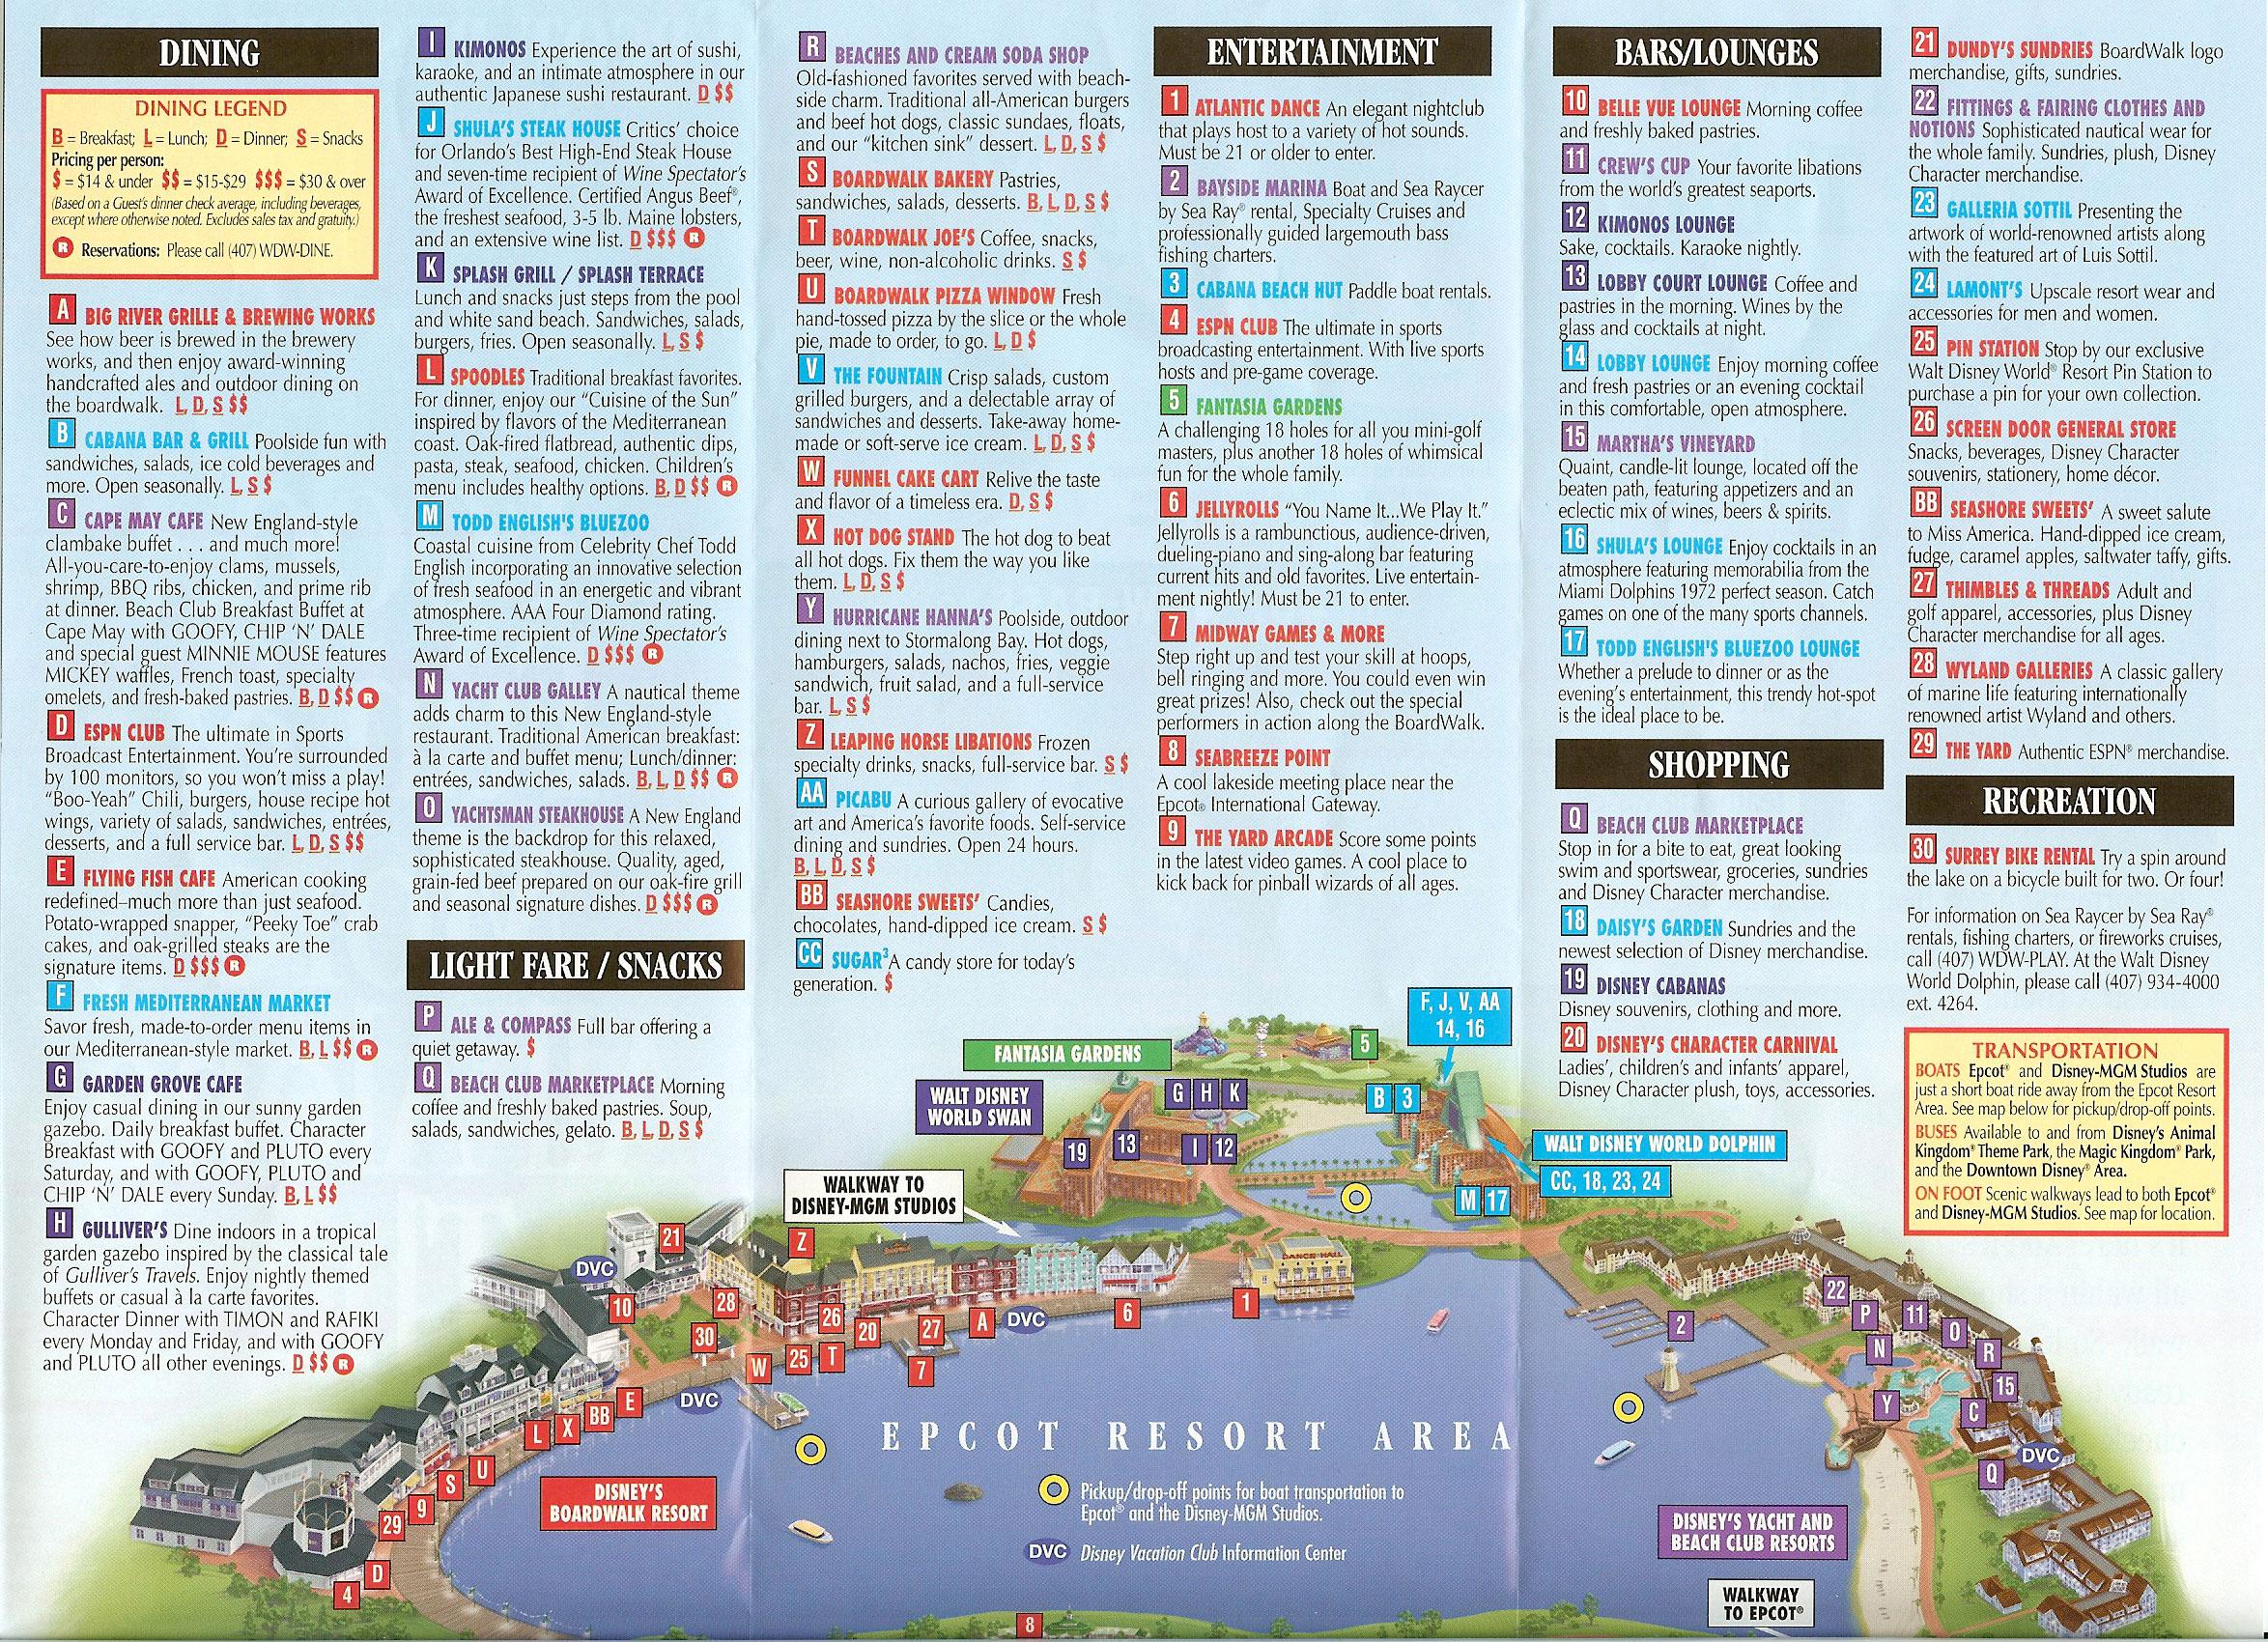 epcot resort area map  wdwinfocom -